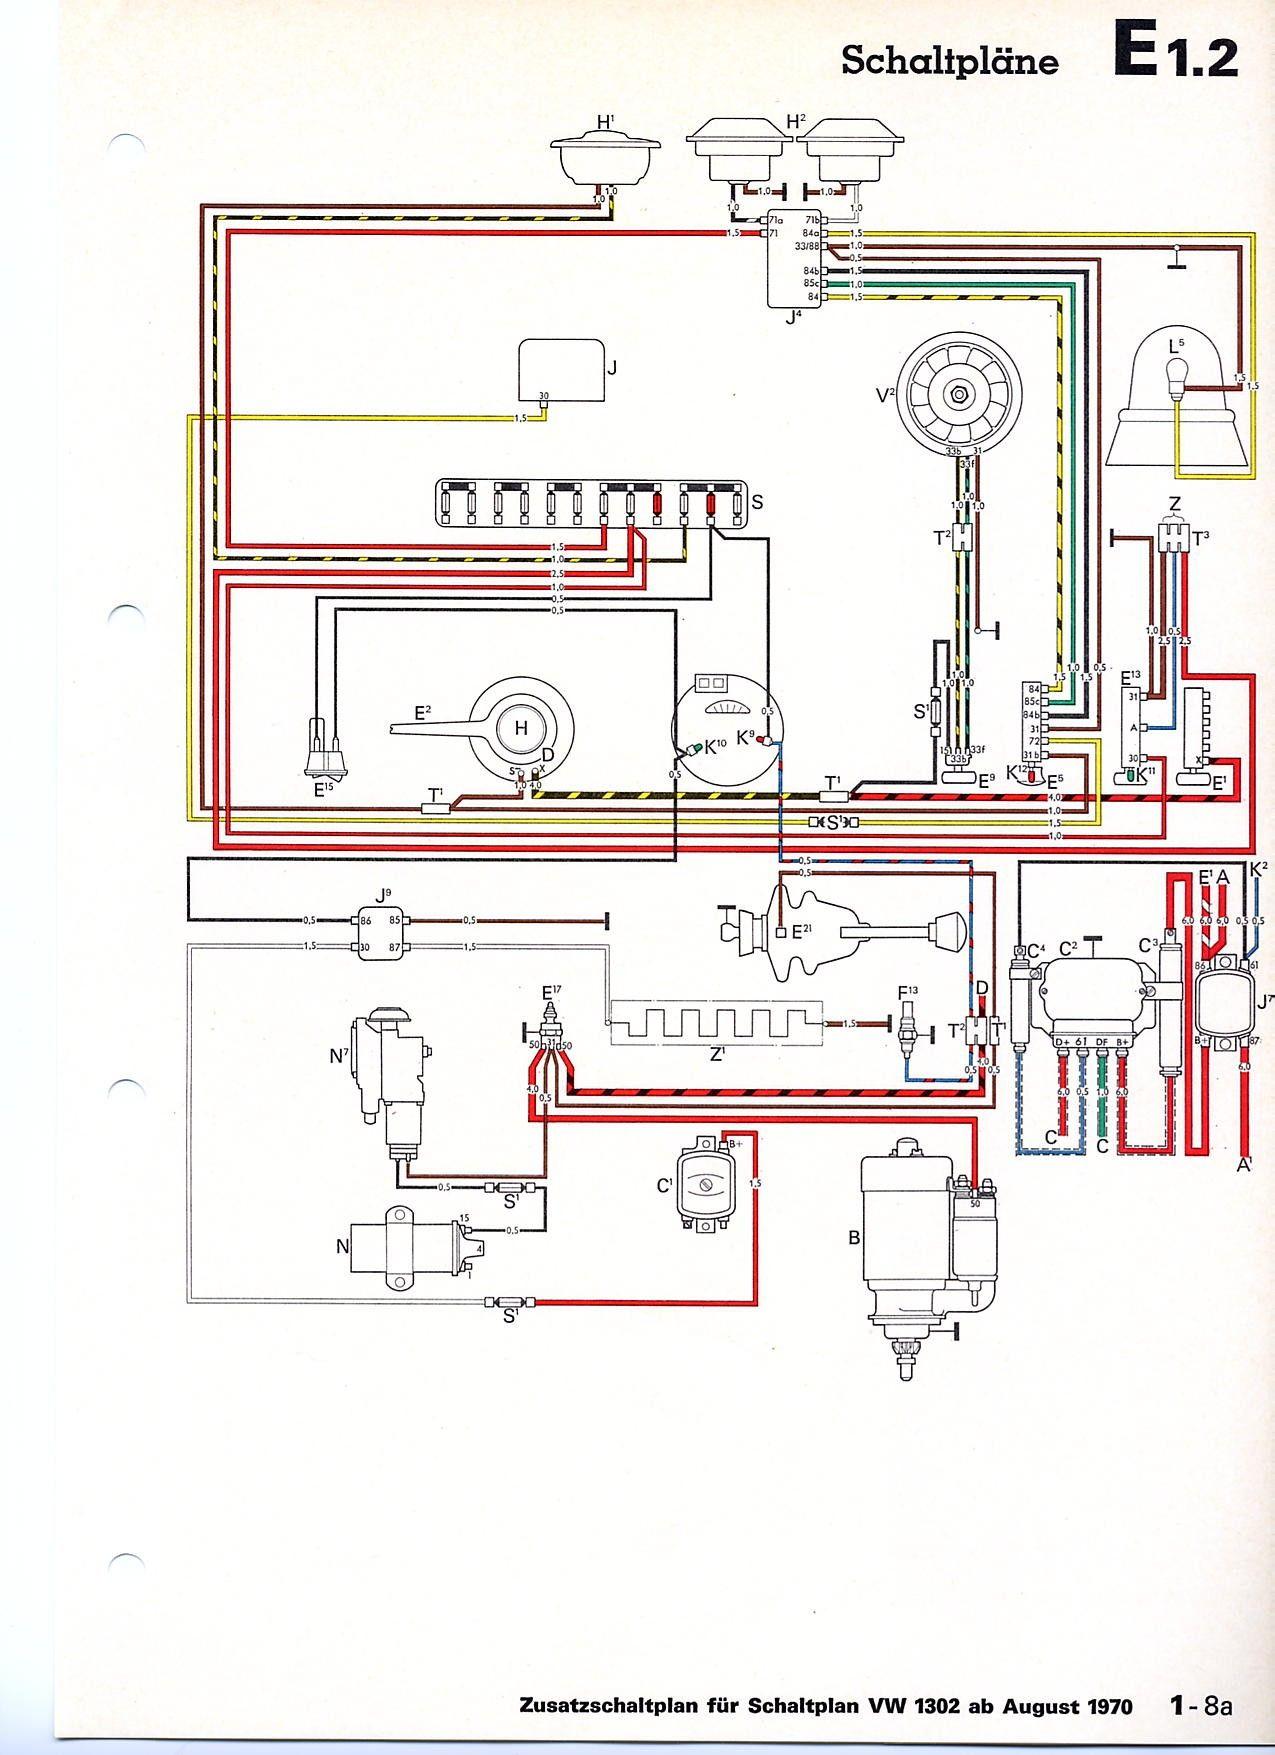 Vw Beetle Voltage Regulator Wiring Diagram Unique In 2020 Voltage Regulator Diagram Vw Beetles